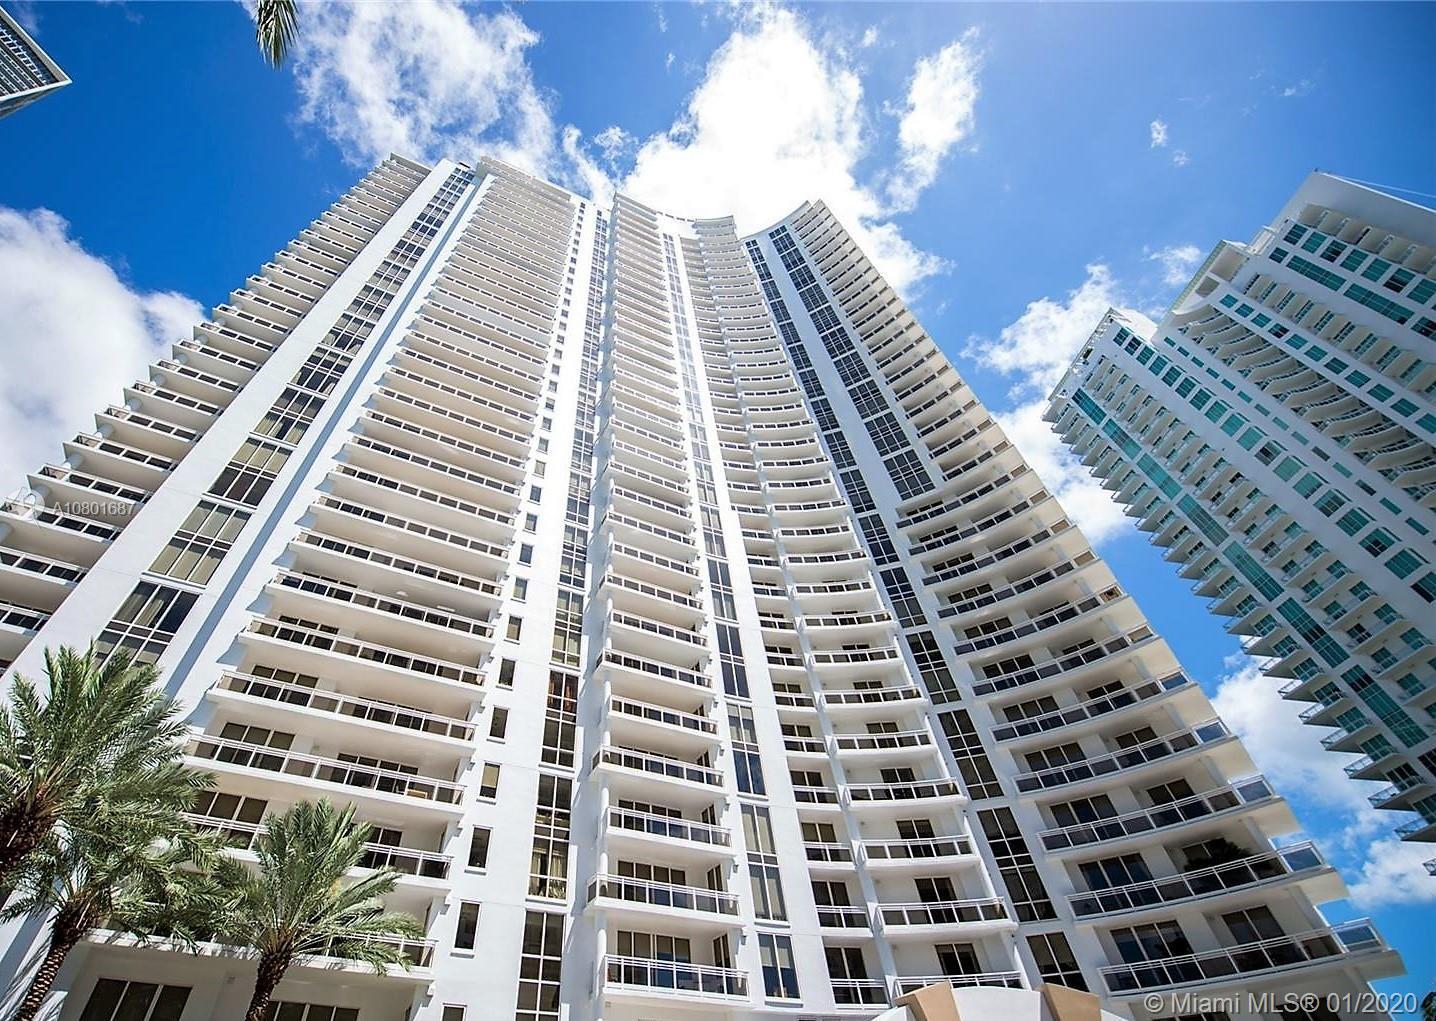 Beautiful corner unit with amazing bay, ocean, city, Miami river & skyline views in the unique and e